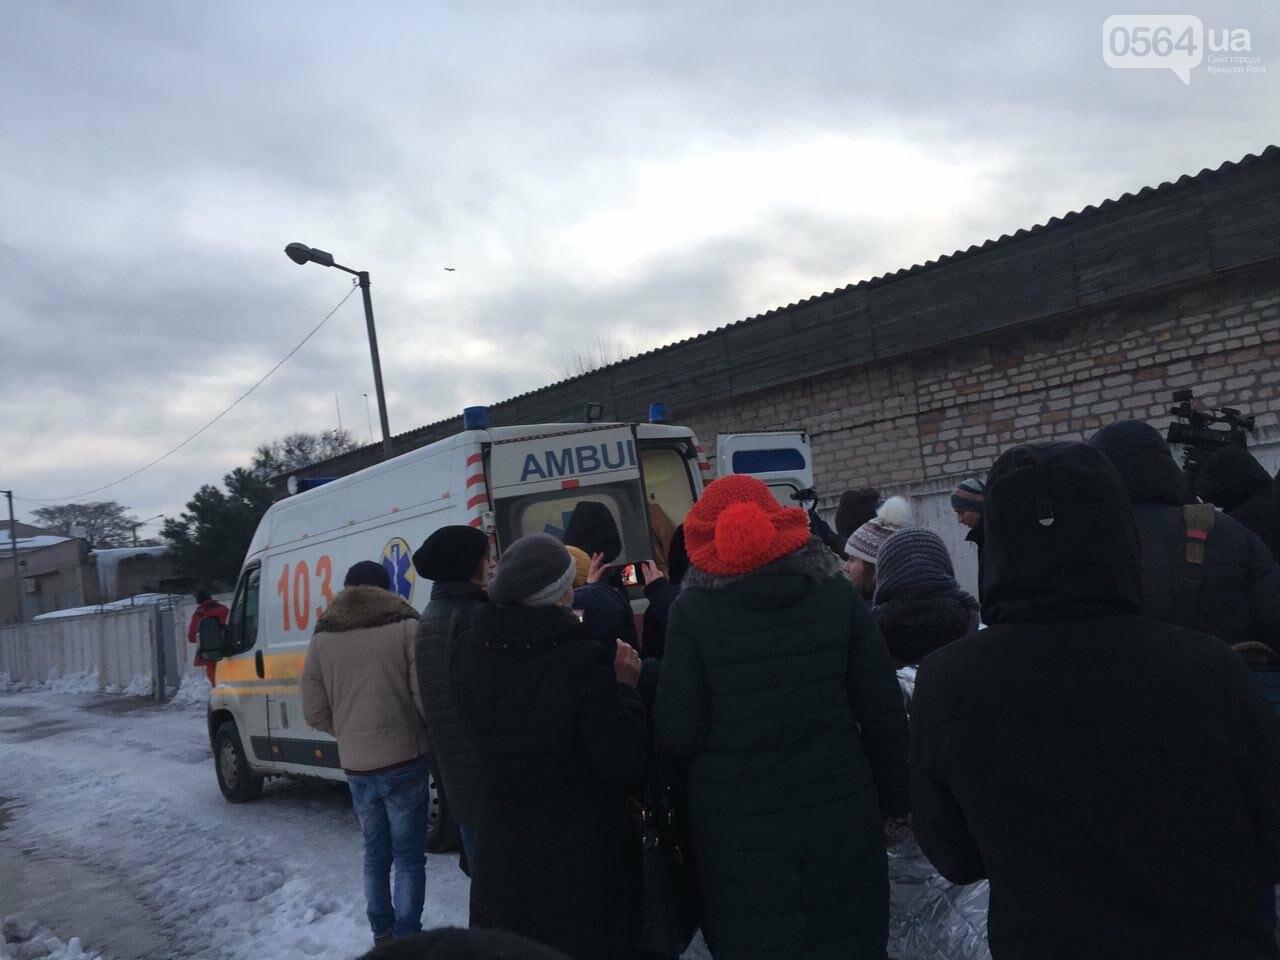 В Кривой Рог вернулся журналист Вячеслав Волк, тяжело раненый во время учений резервистов (ФОТО), фото-5